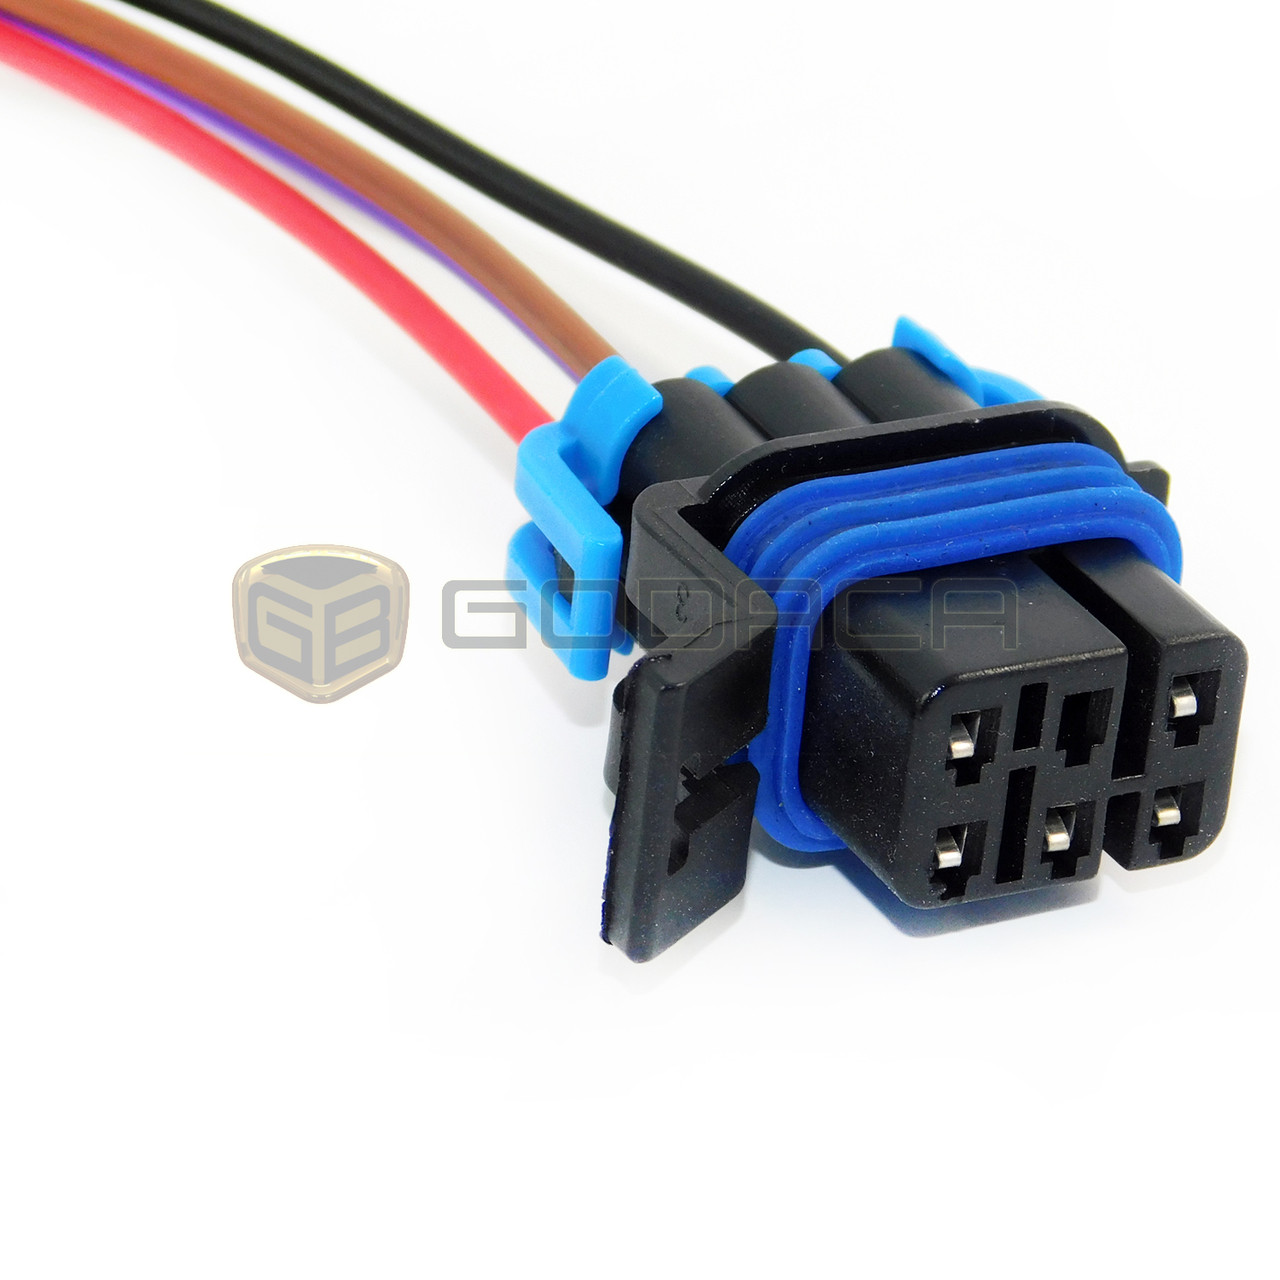 medium resolution of connector fuel pump sensor harness pigtail fpw4 gmc buick pontiac chevrolet godaca llc